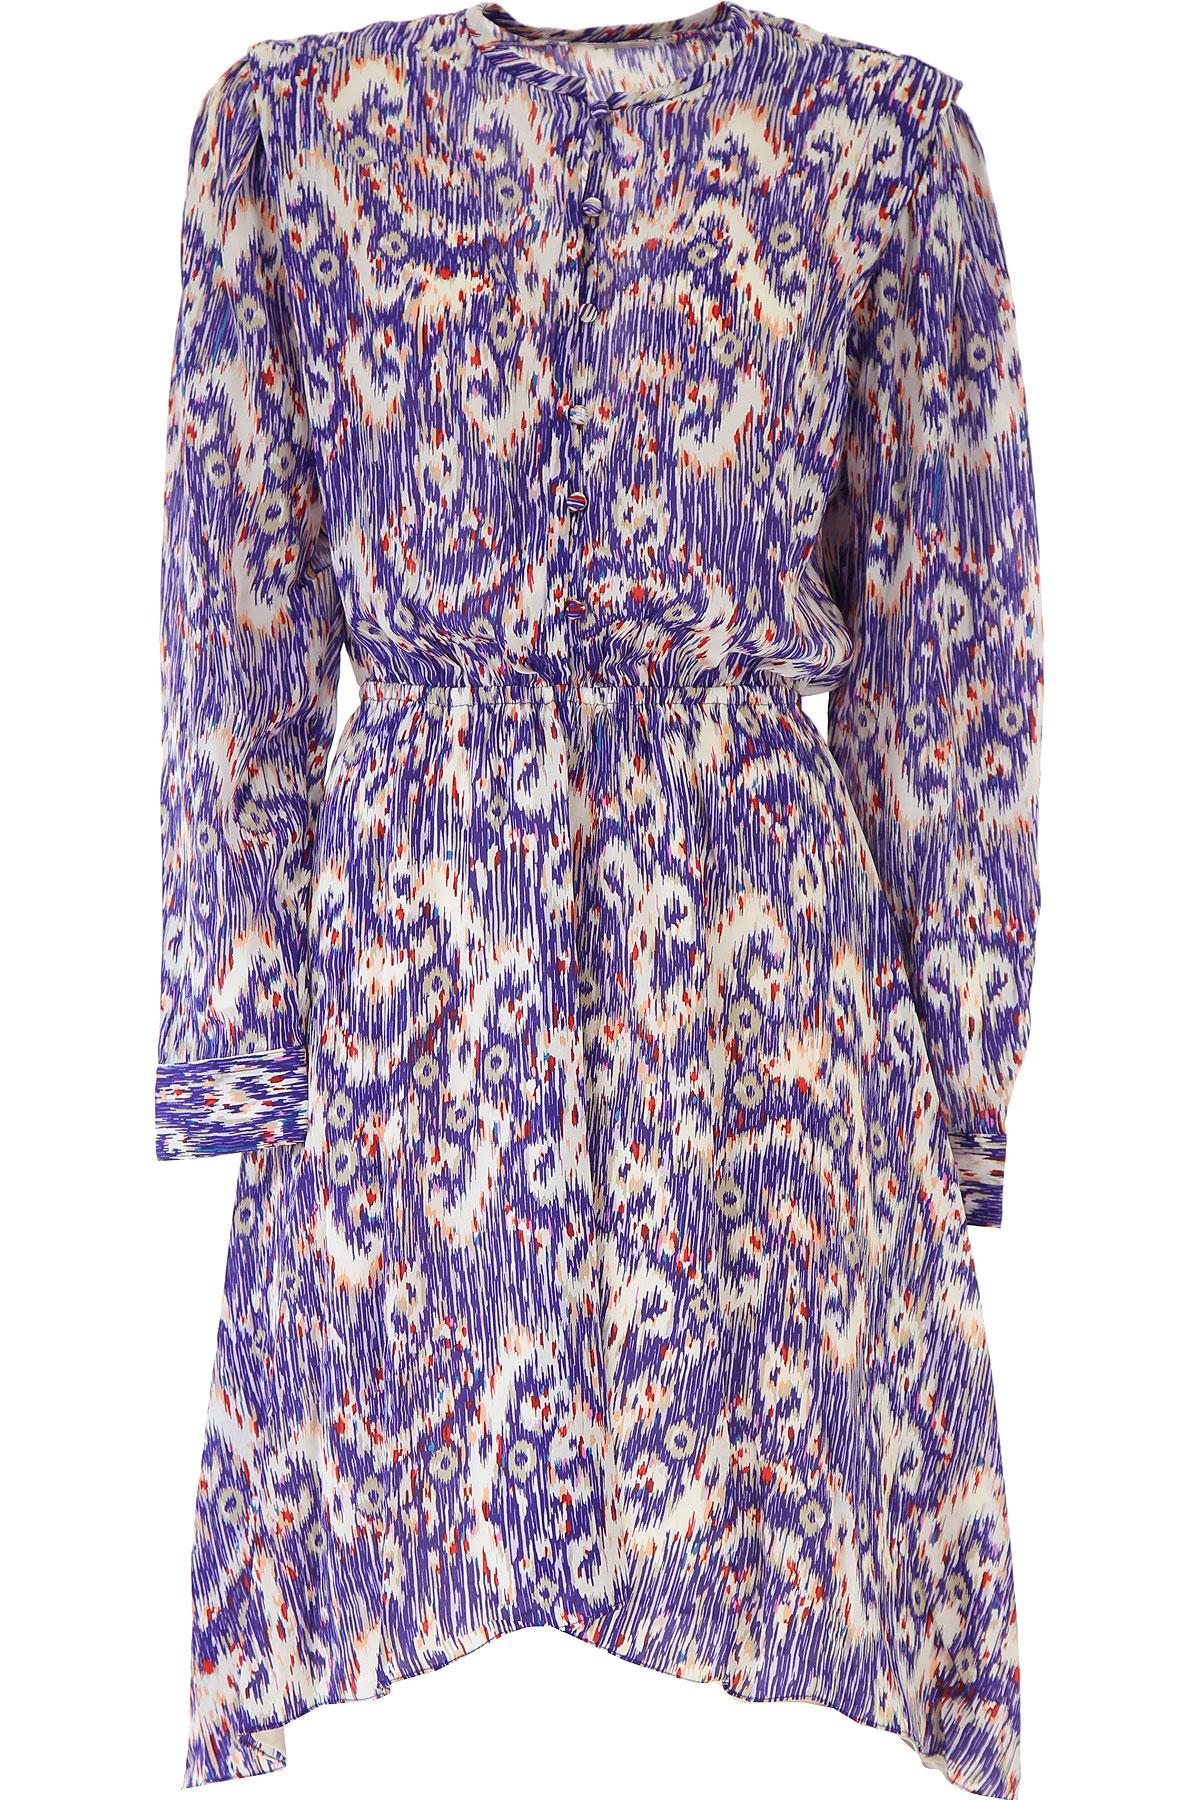 Isabel Marant Dress for Women, Evening Cocktail Party On Sale, Violet Blue, Silk, 2019, 4 6 8